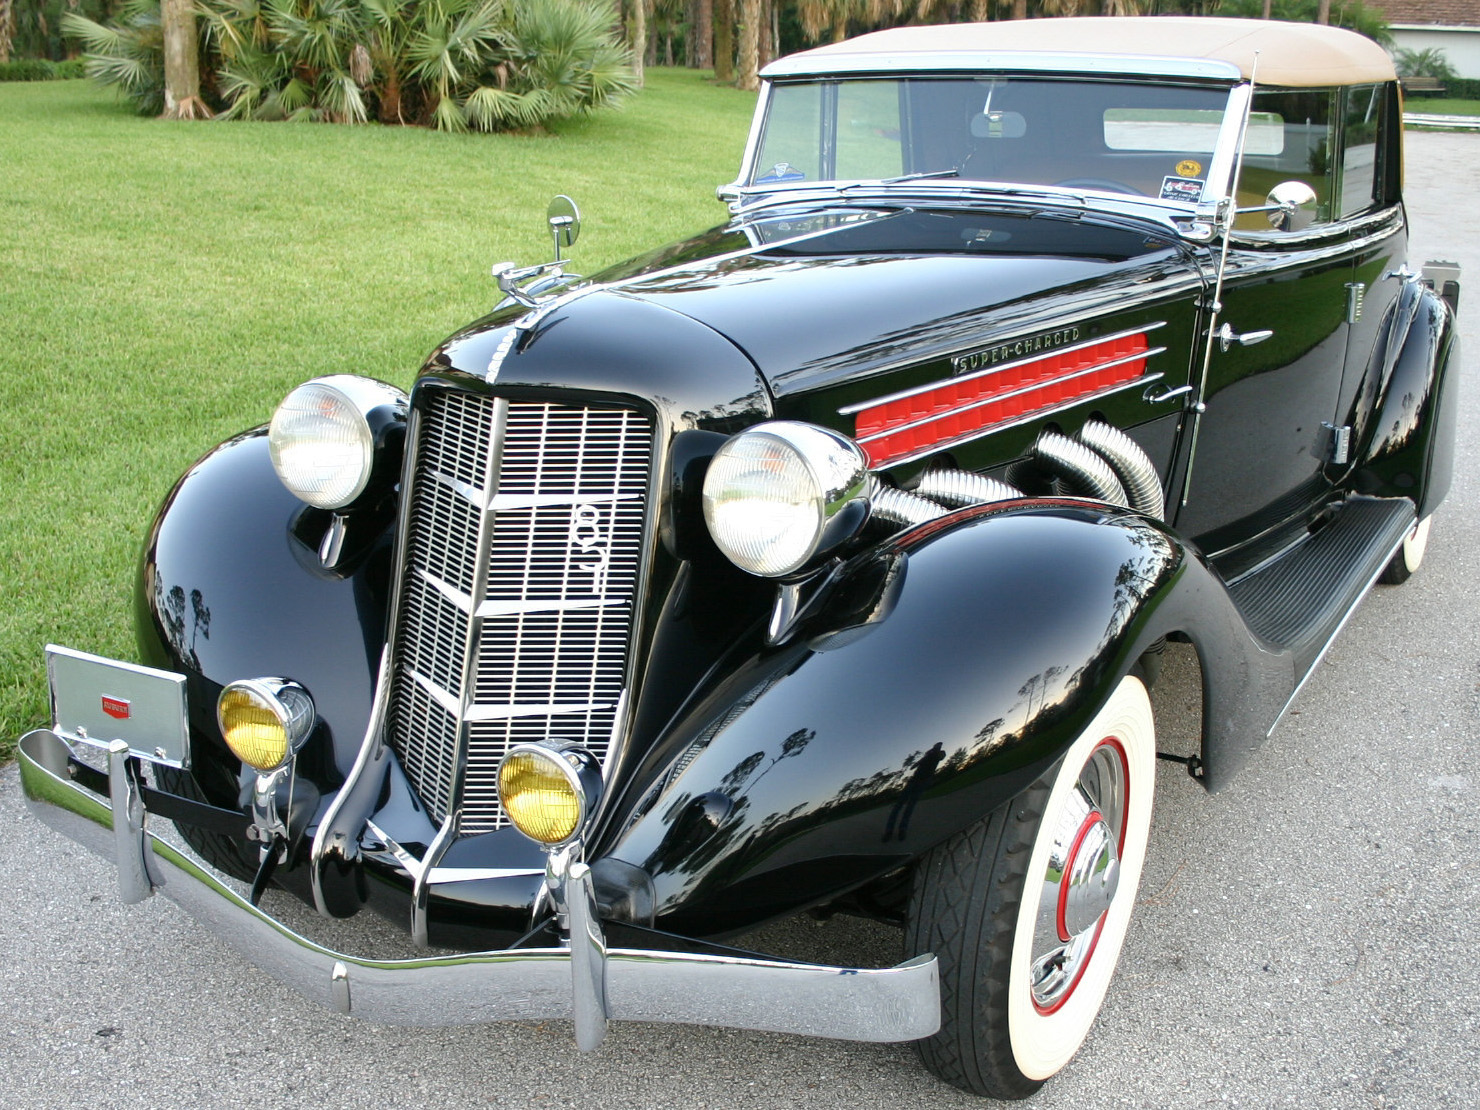 Auburn-Cord-Duesenberg (ACD) 1925-1937